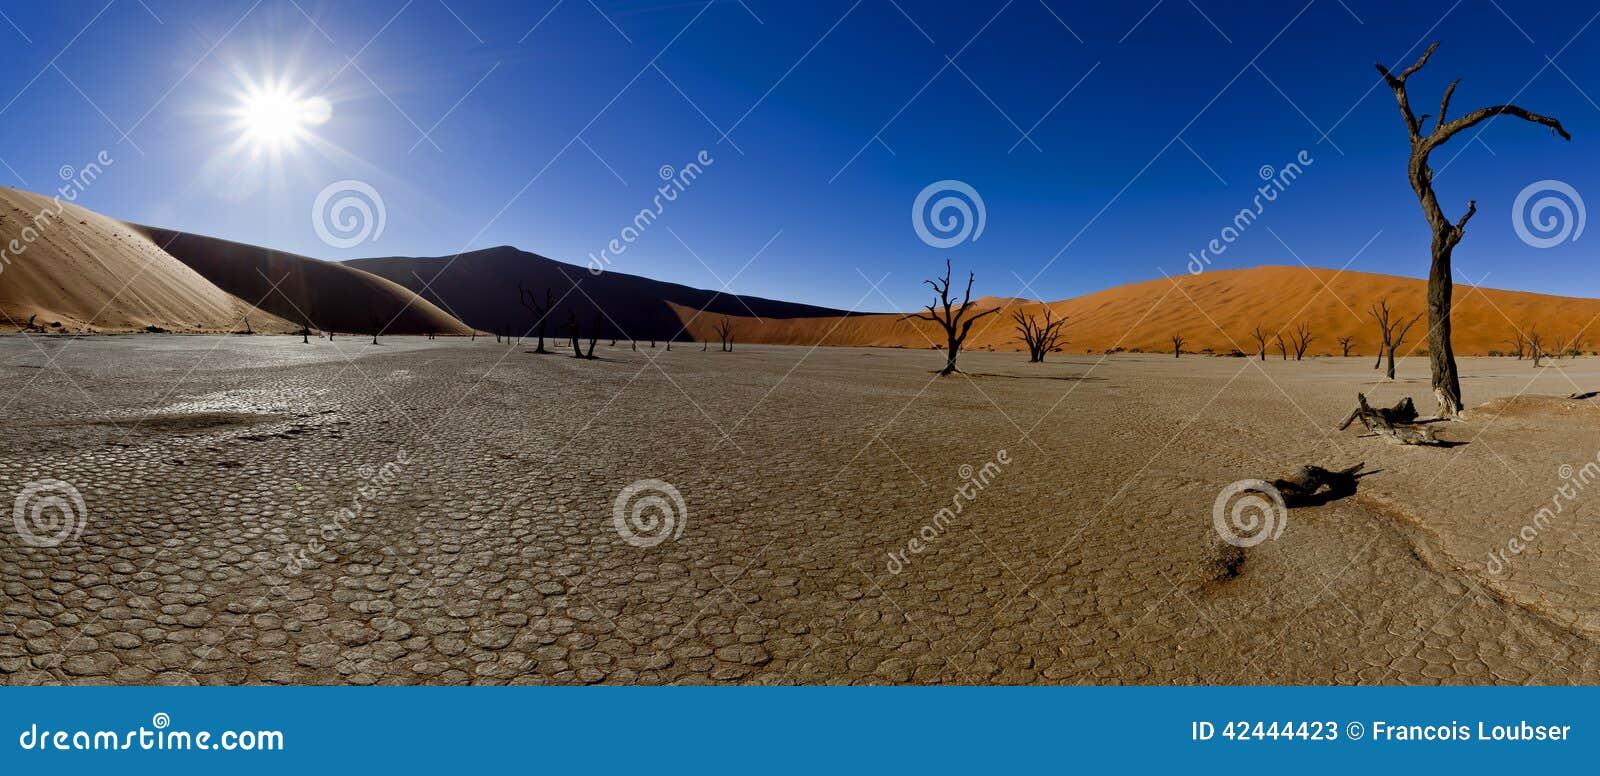 Landscaping Over Sand : Panoramic desert landscape stock photo image